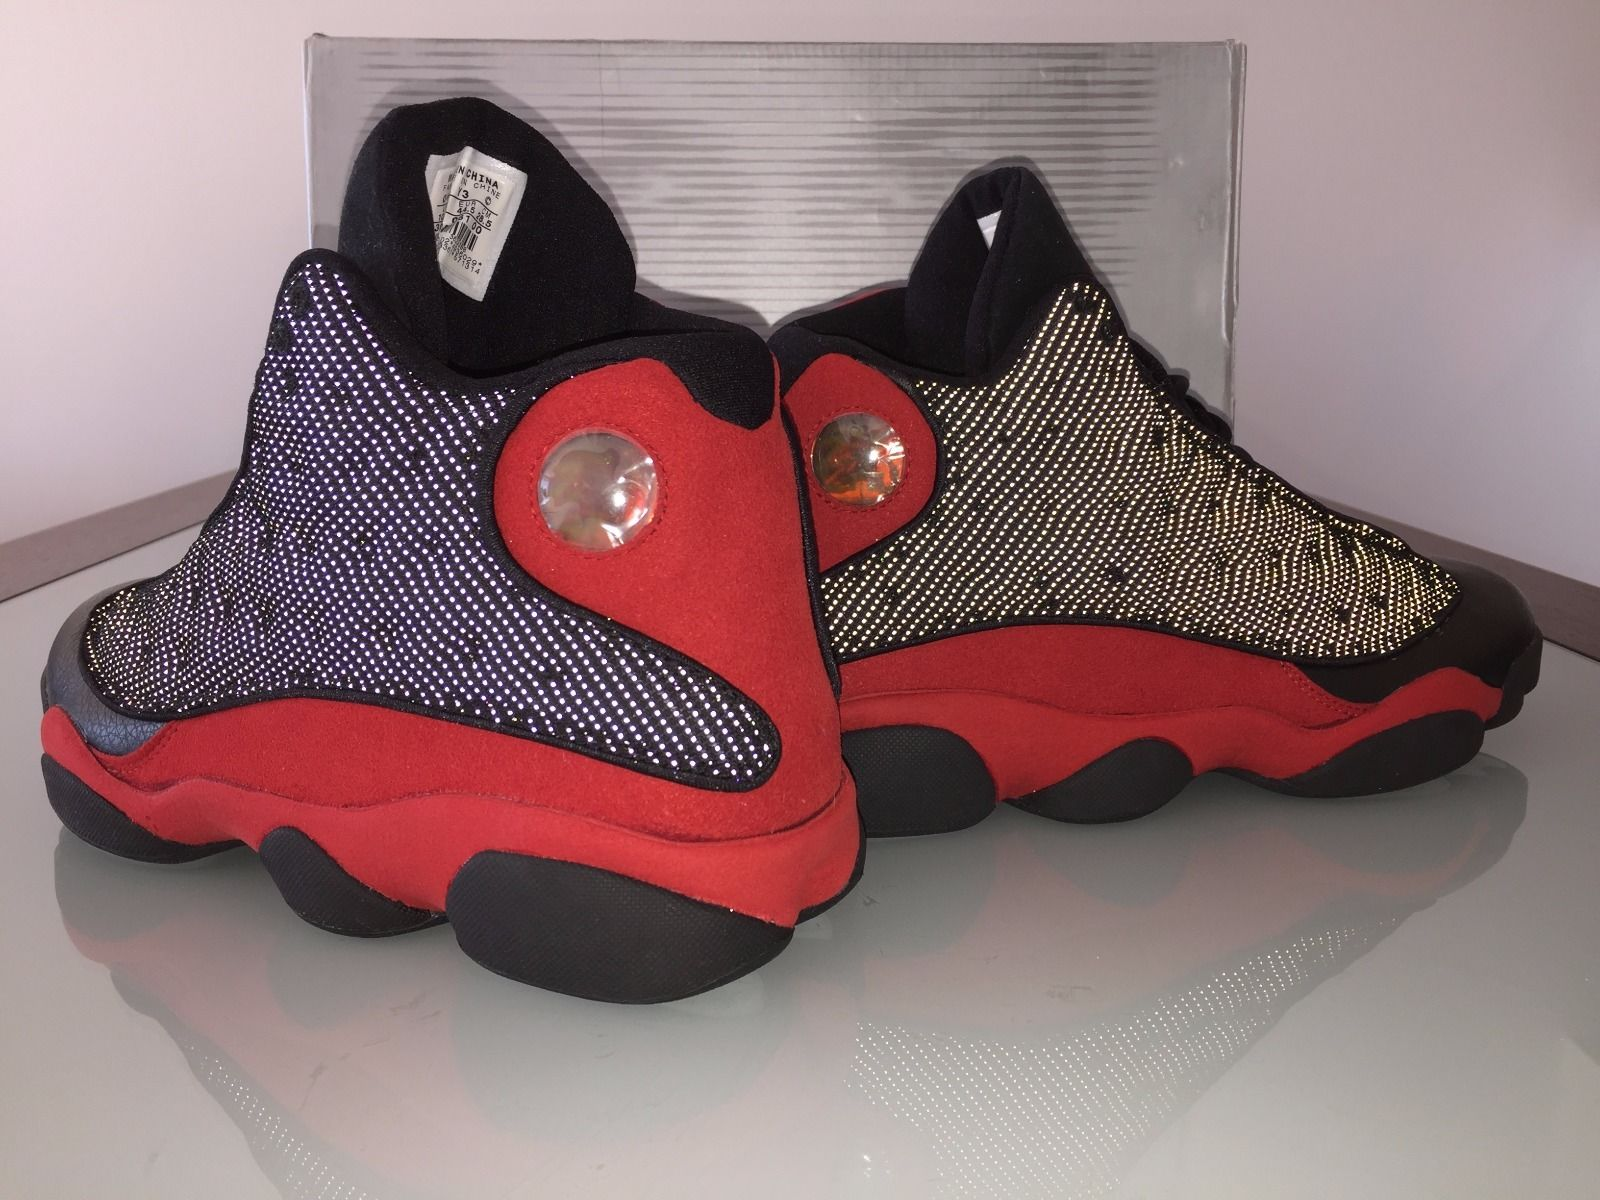 Mens Air Jordan 13 New Combination Black Red shoes